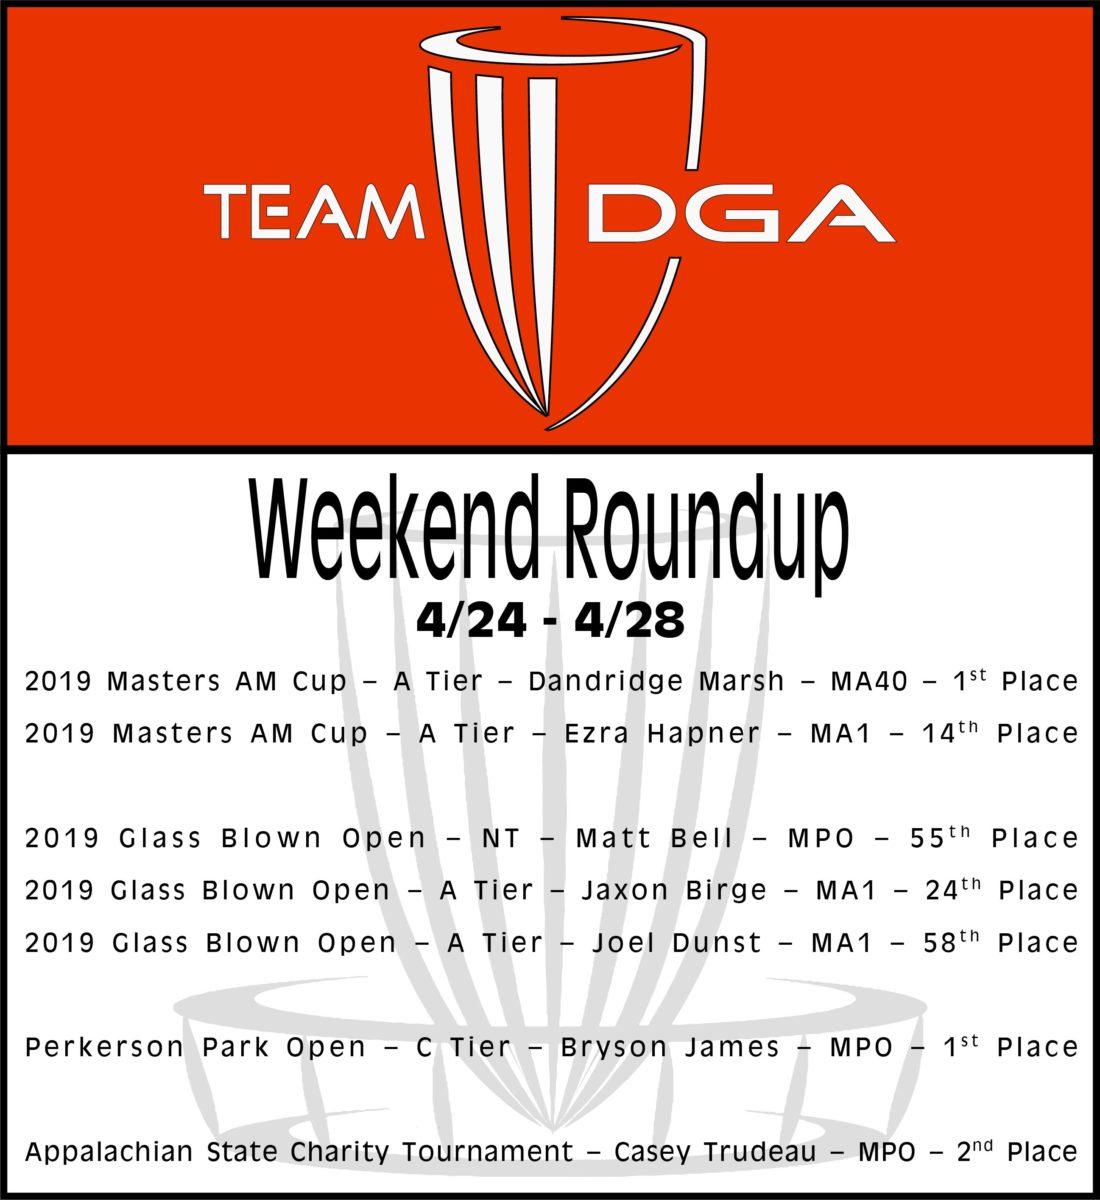 Team DGA Weekend Roundup 4/24 - 4/28